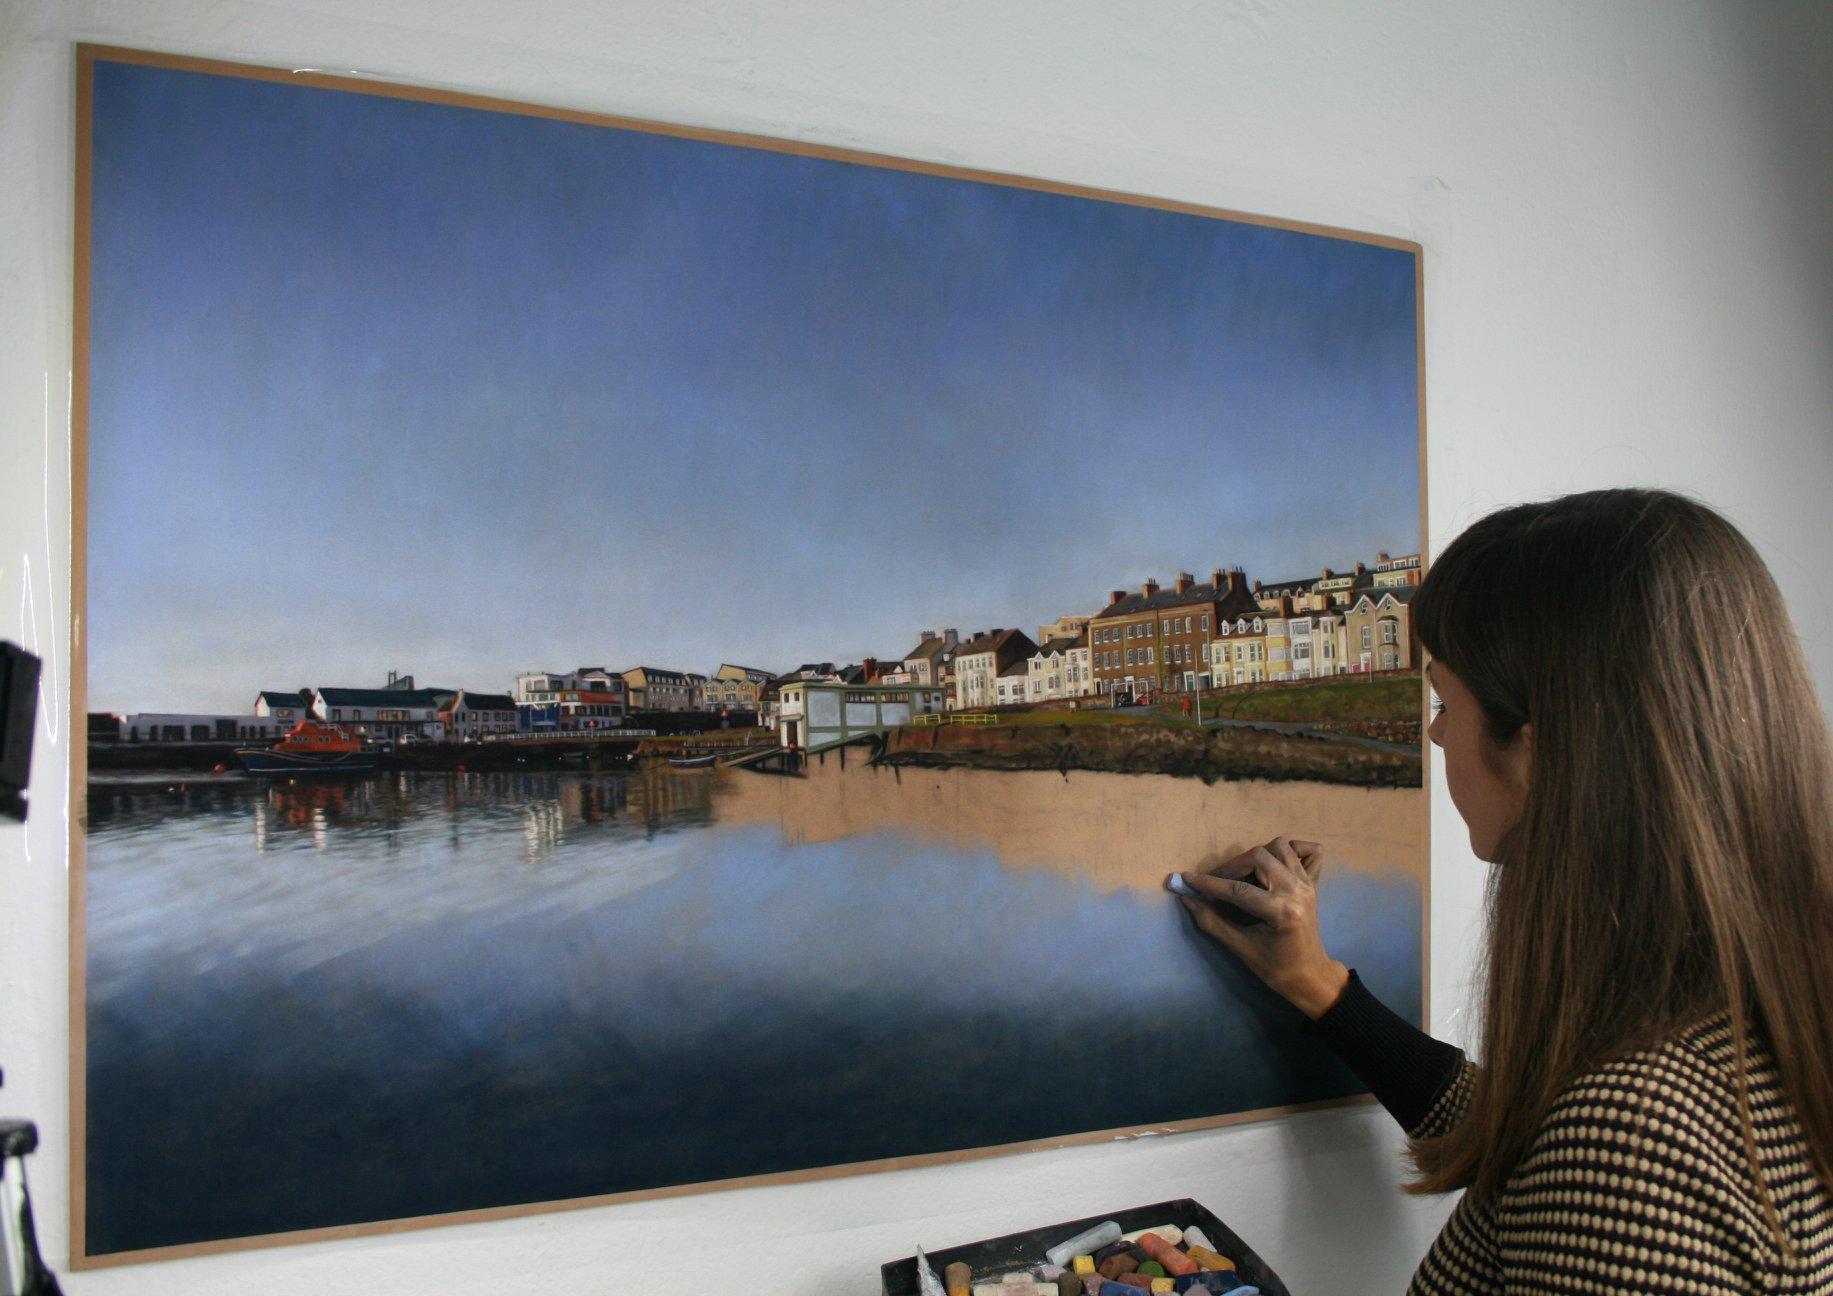 WIP Reflecting on Portrush. Emma Colbert. Jackson's Painting Prize.